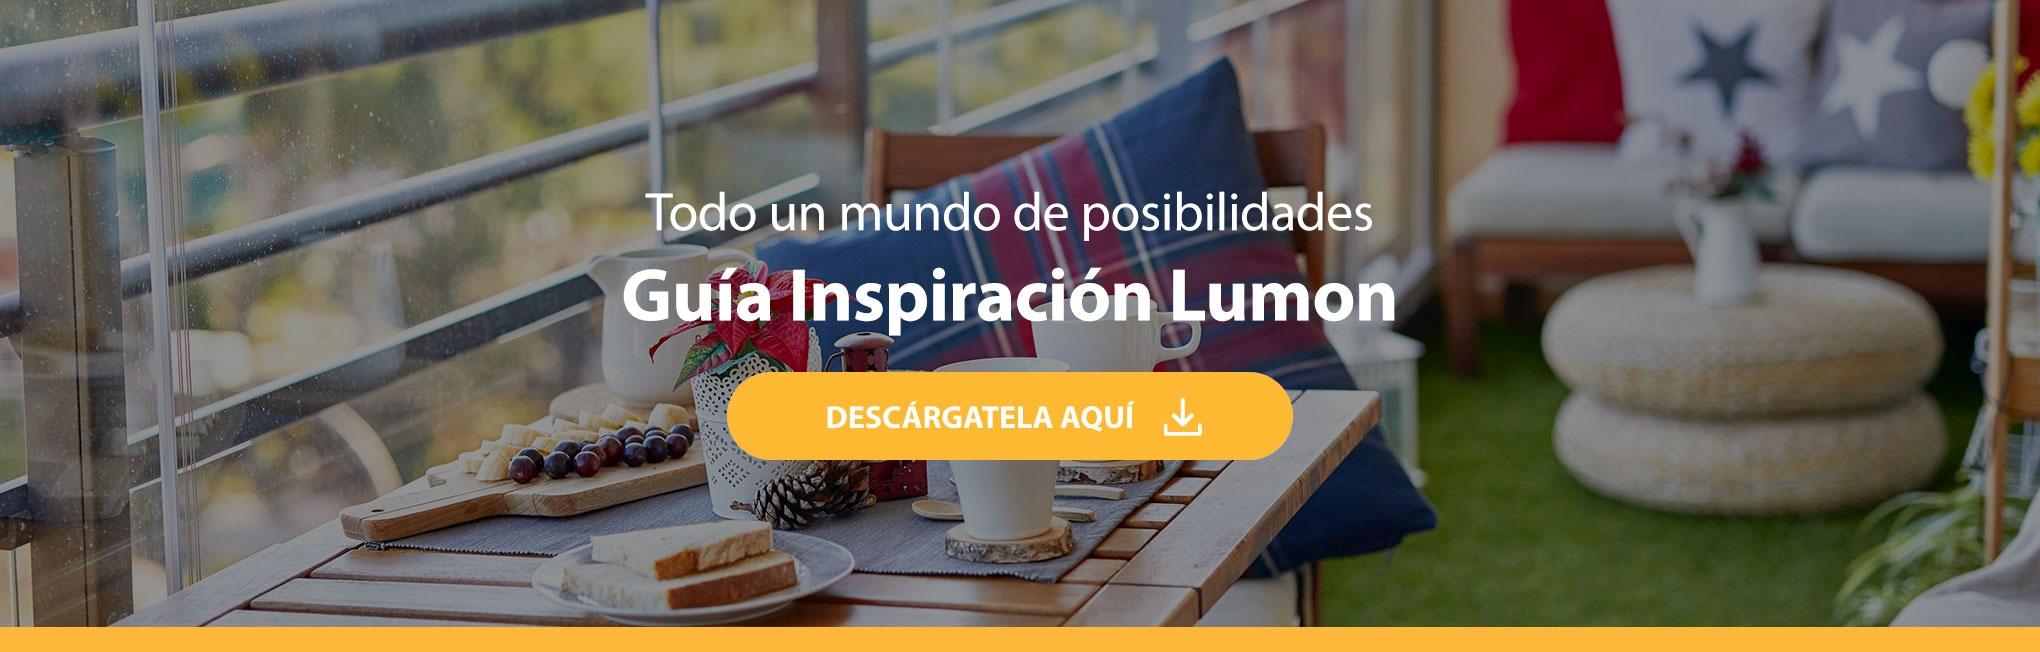 cta-guia-inspiracion-lumon